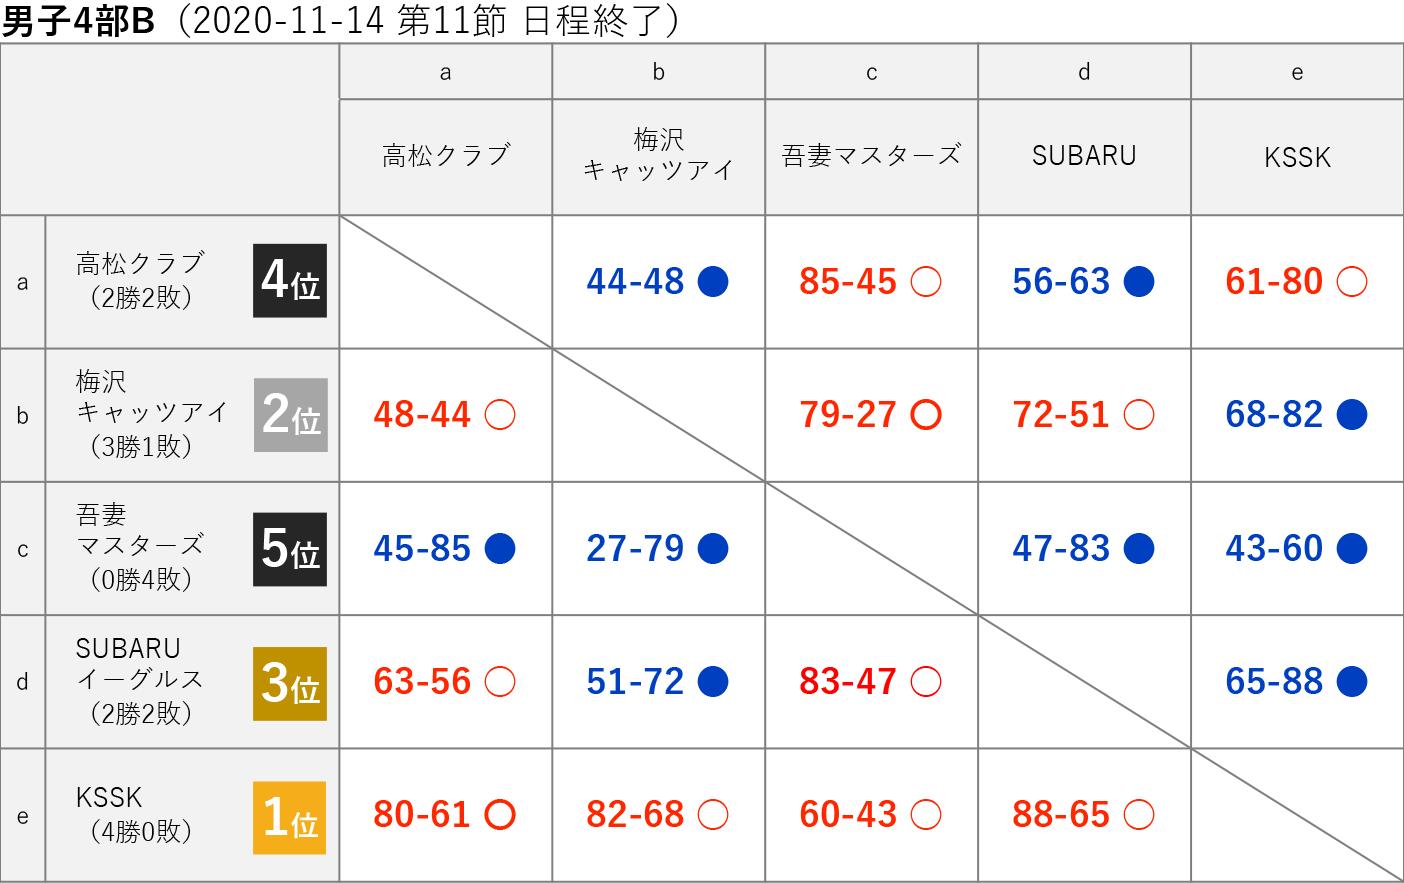 2020社会人リーグ 男子4部B 星取り表 2020-11-15(第12節日程終了)